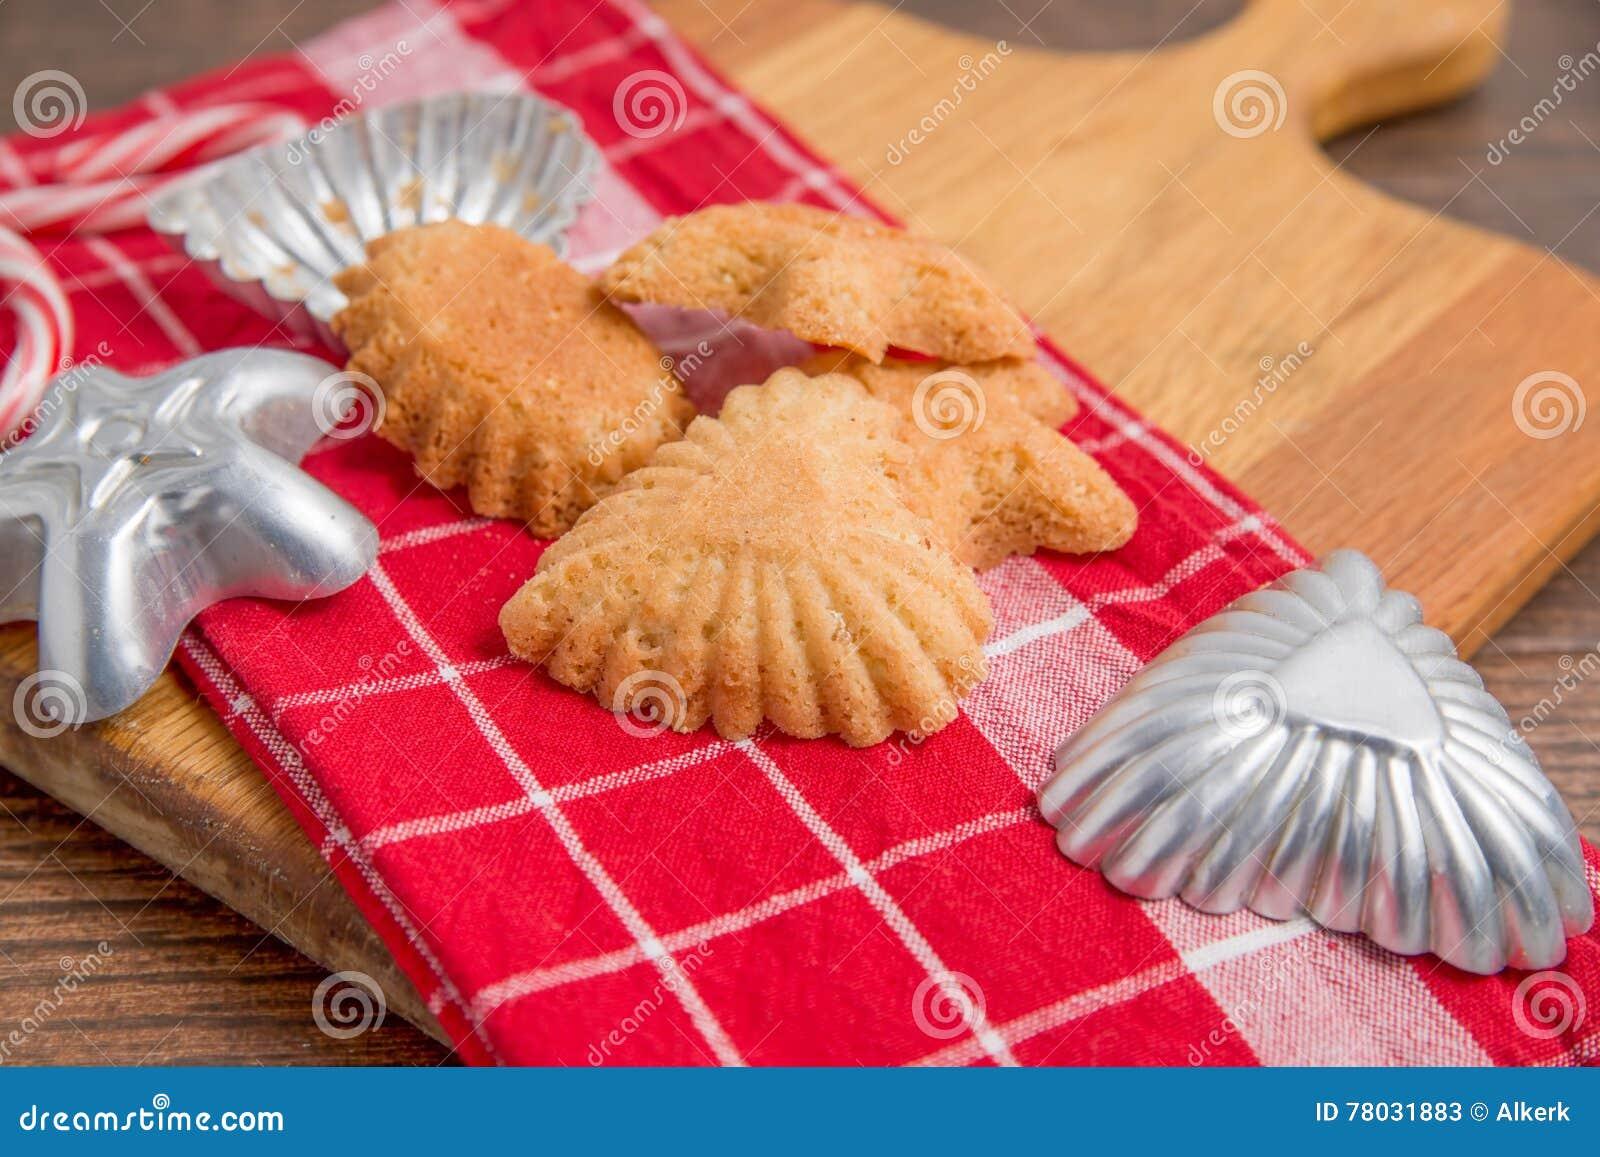 Norwegian Christmas Cookies Sandbakkels Stock Image Image Of